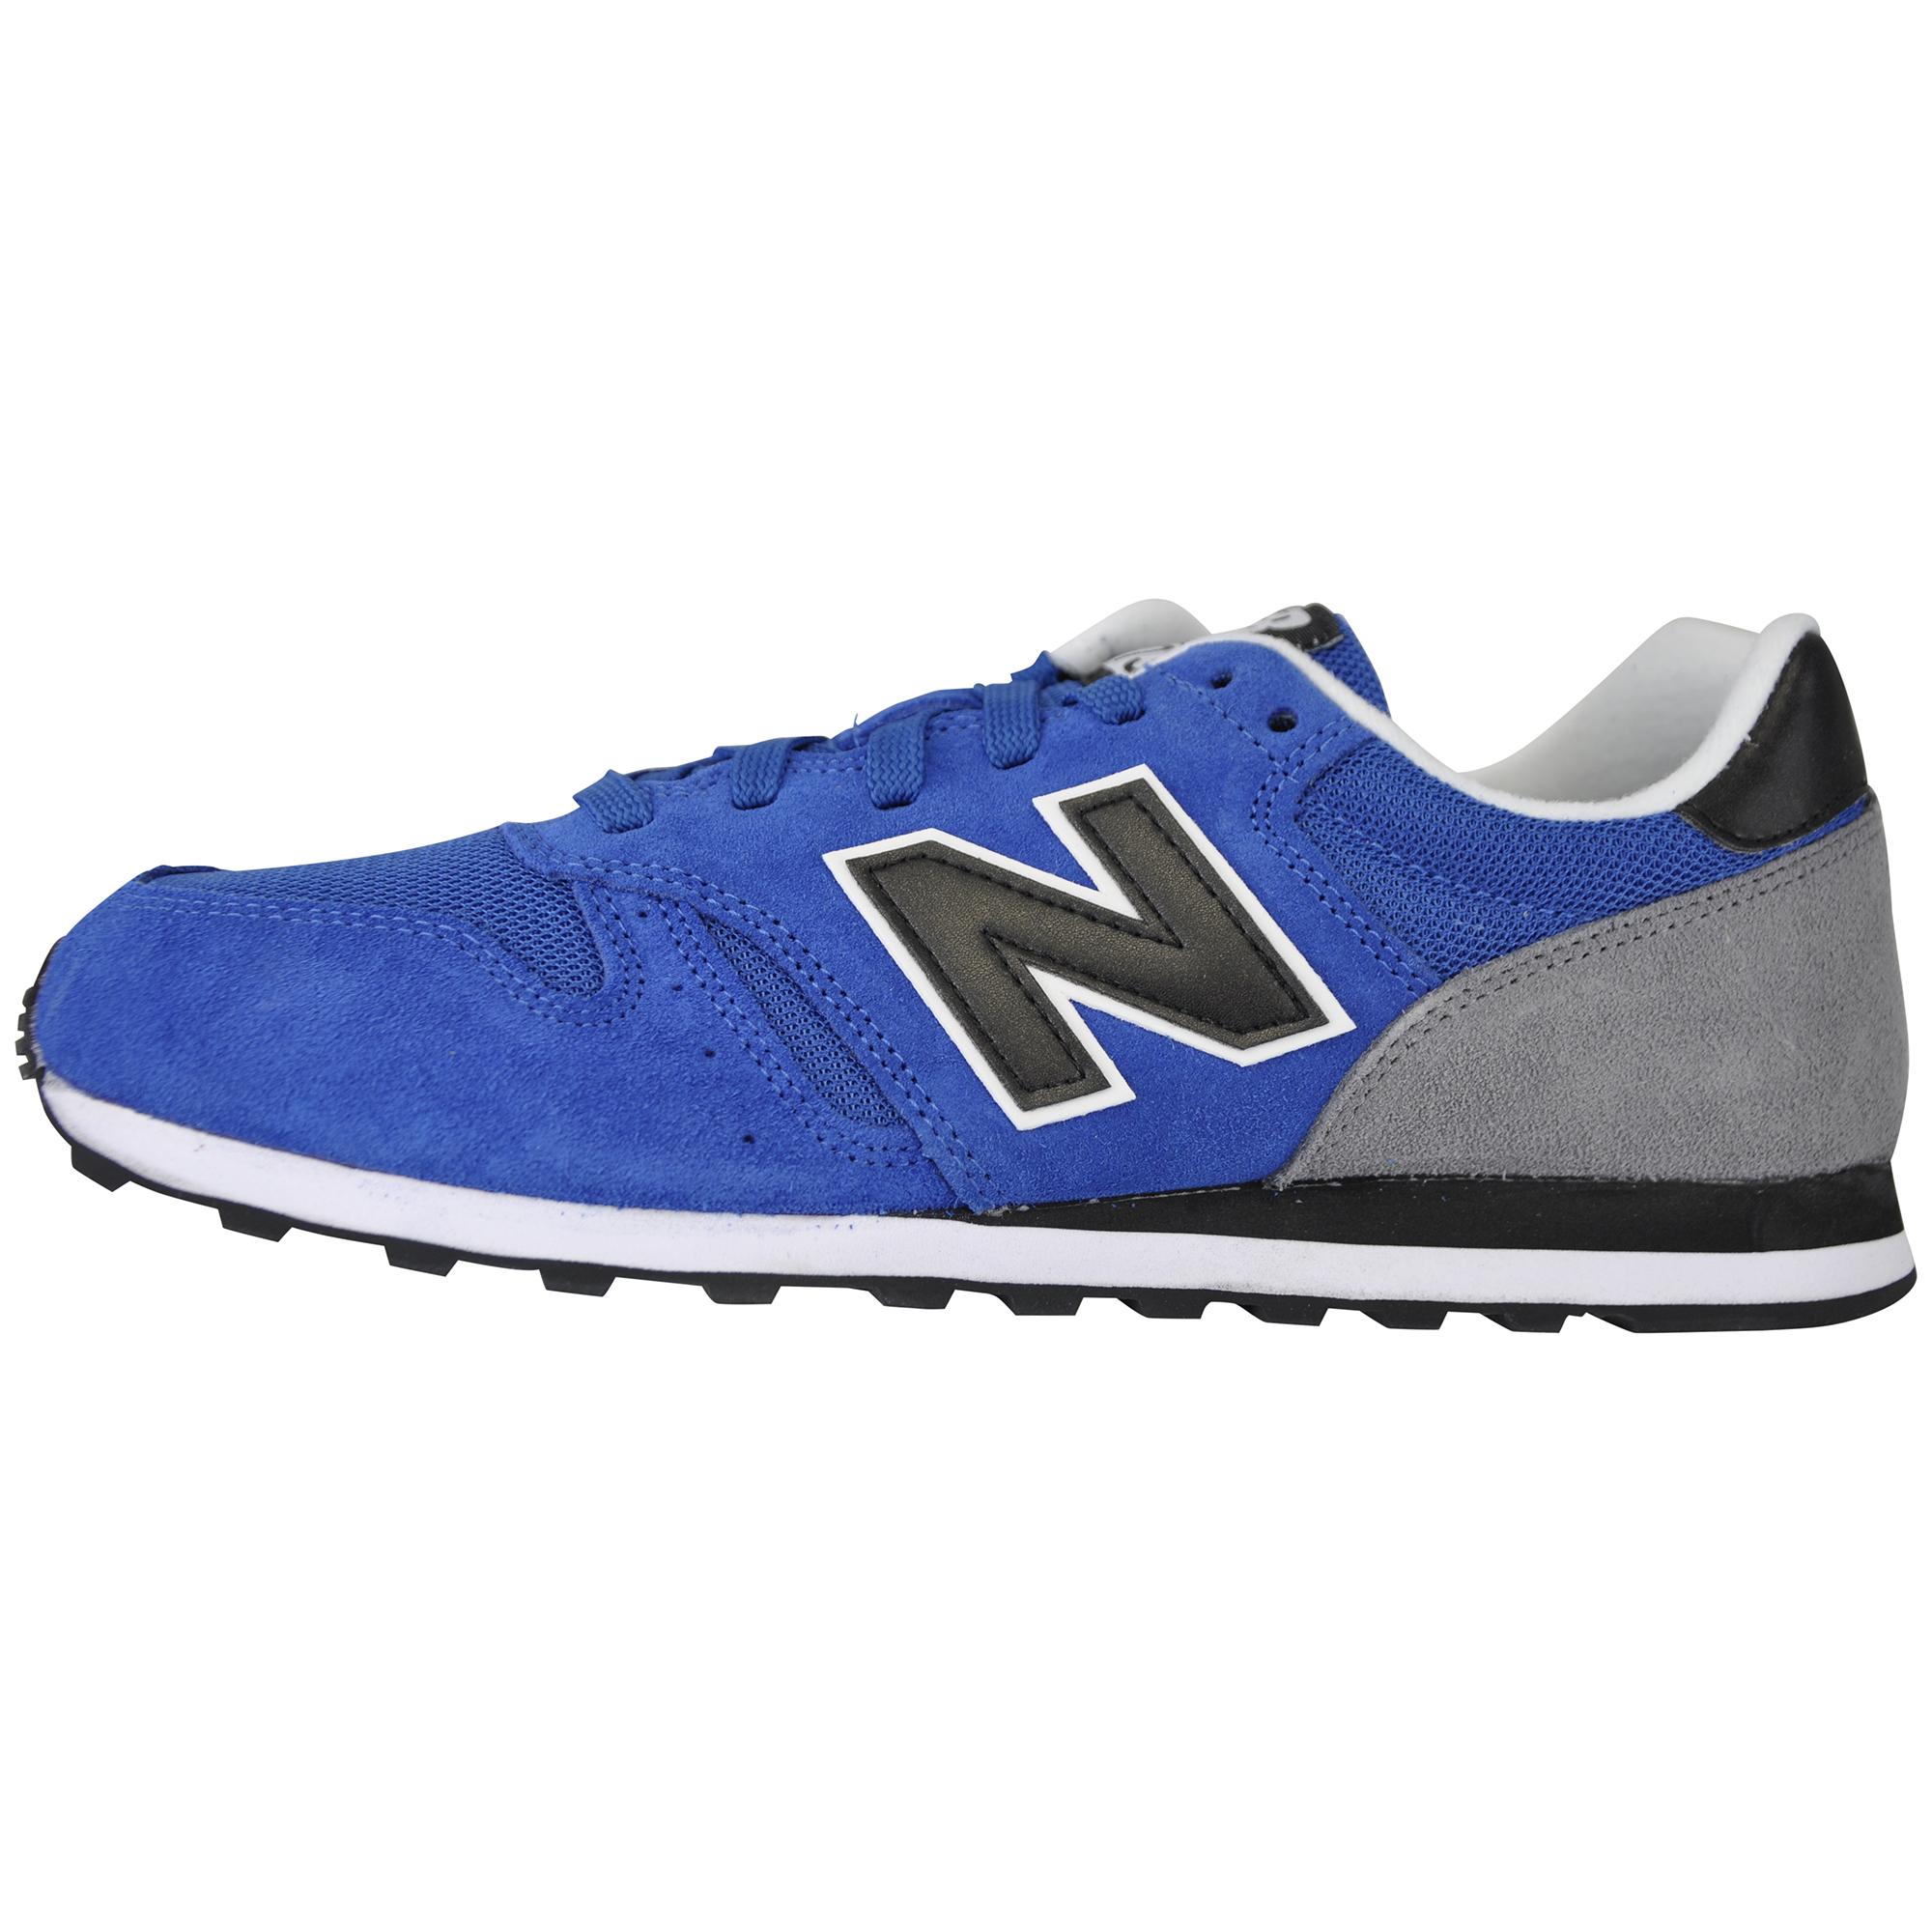 New Balance M530 zapatos